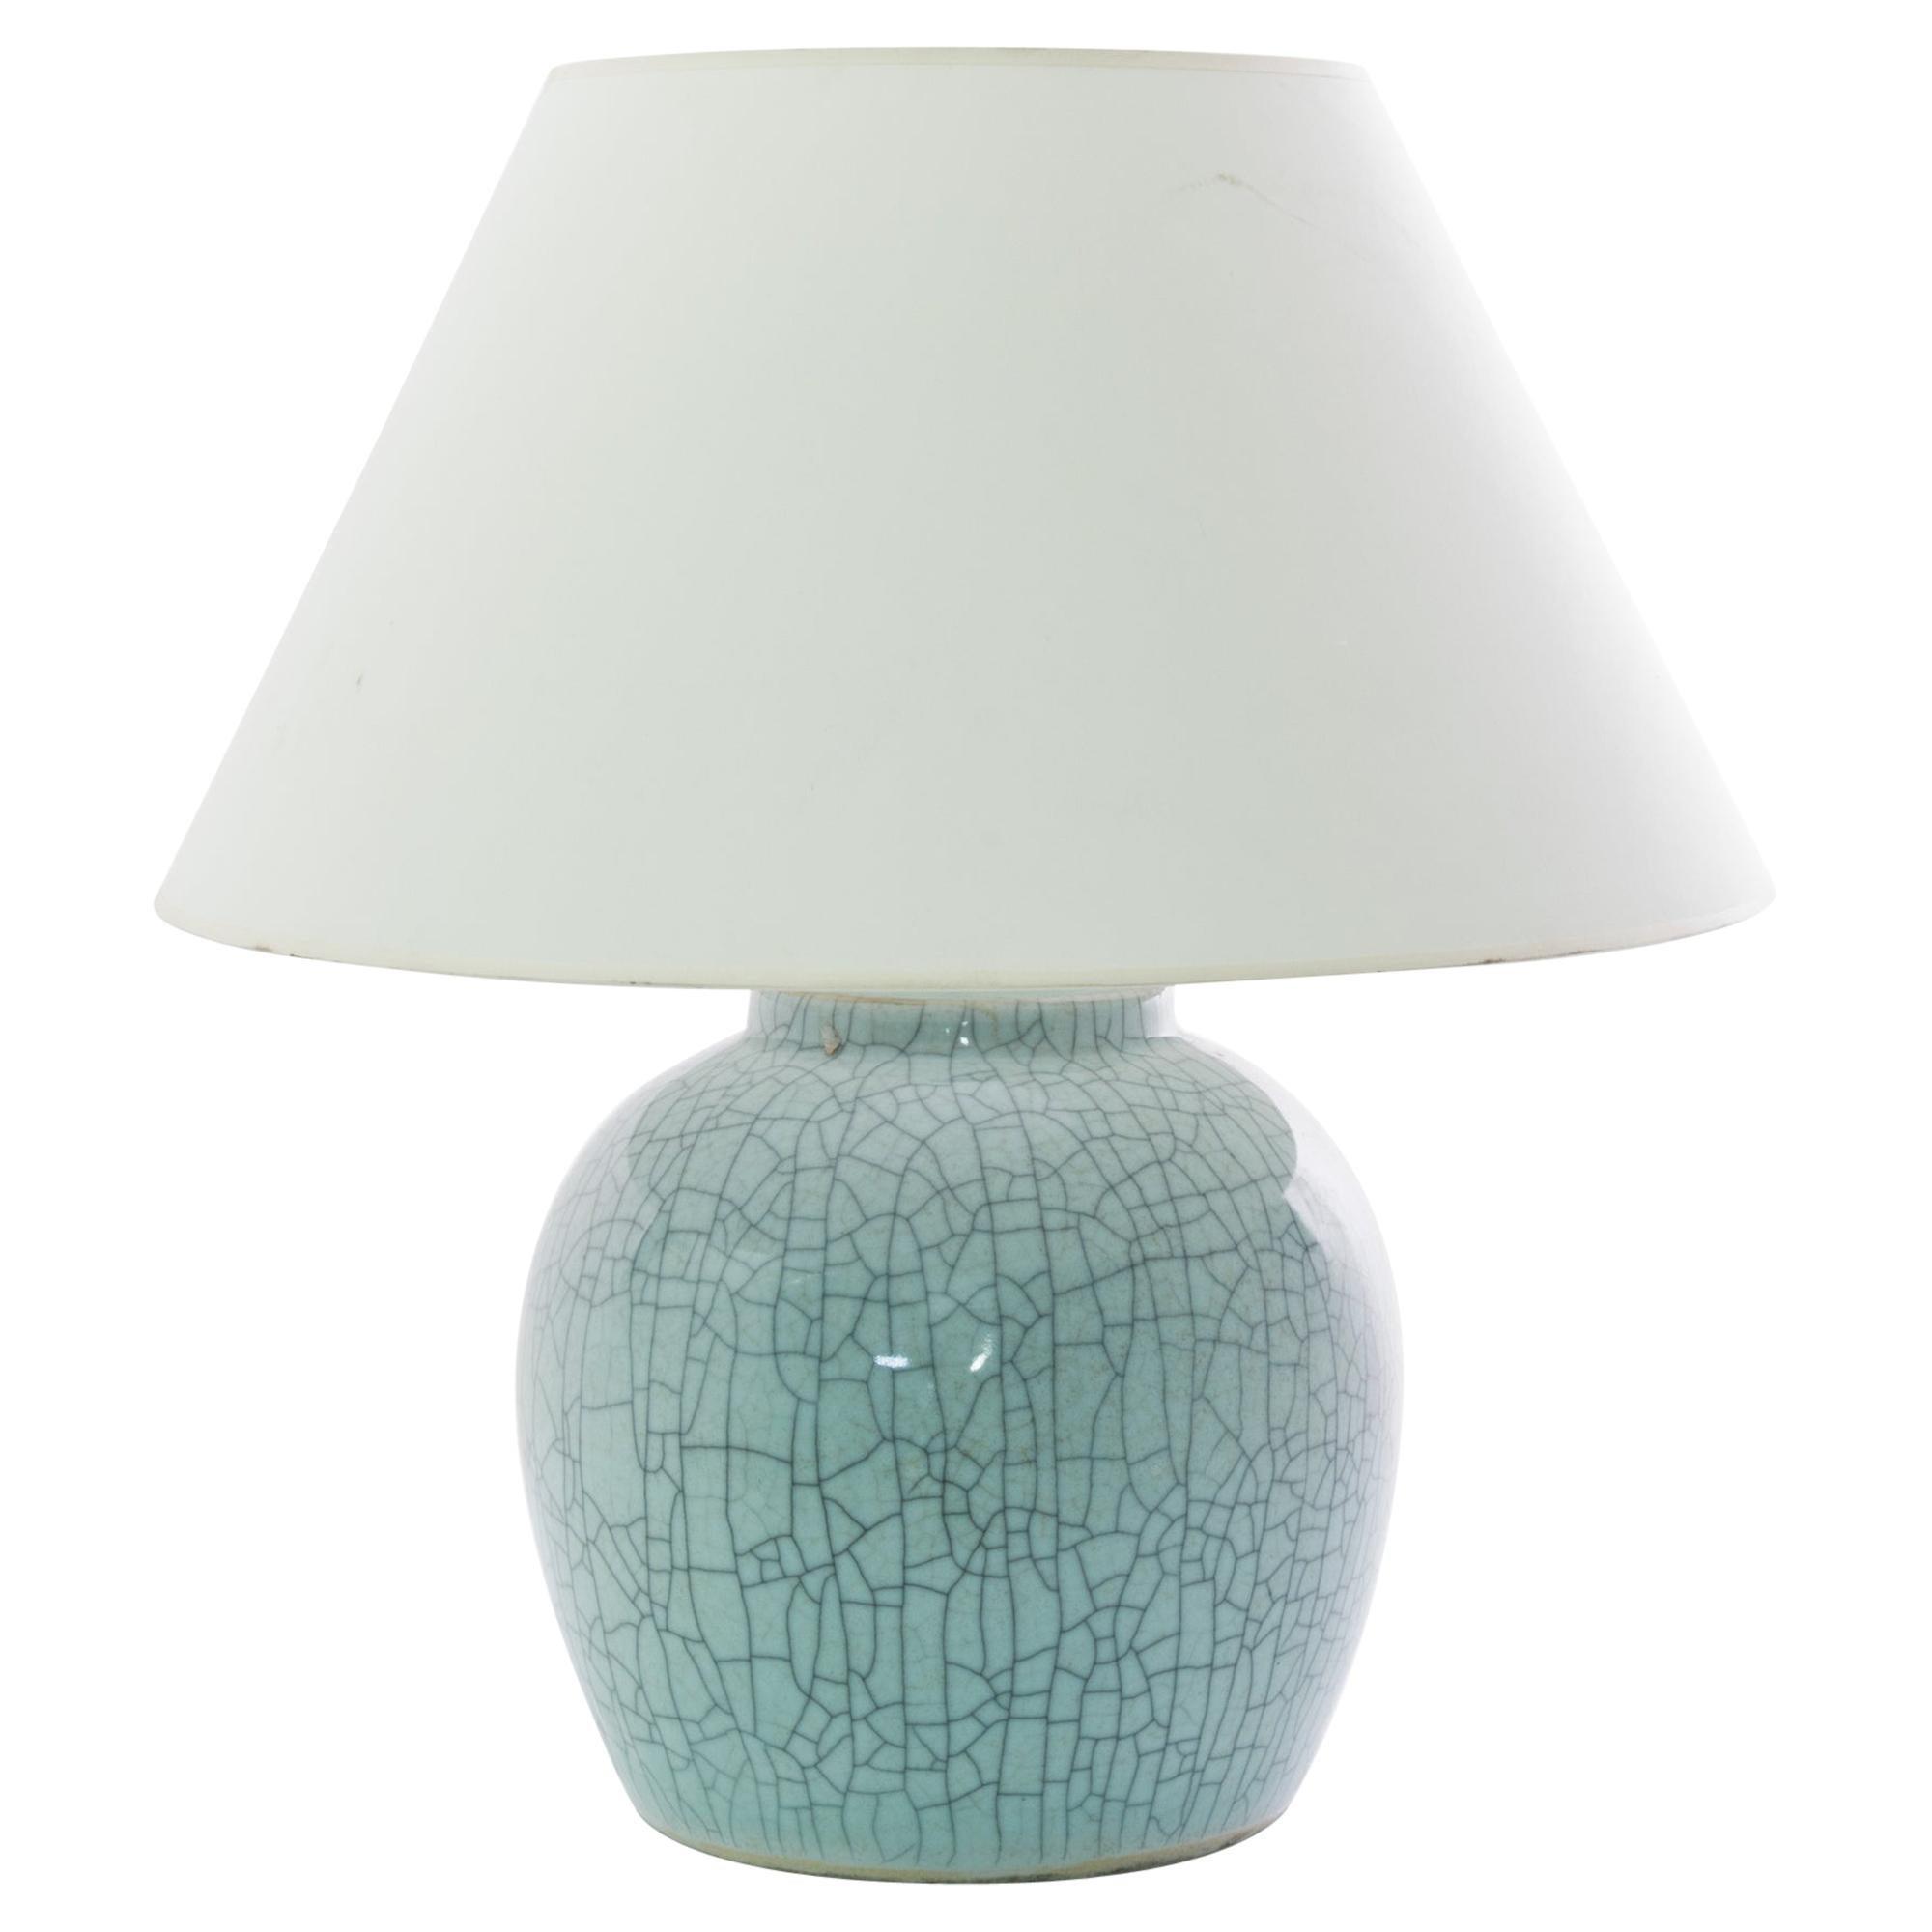 Antique Chinese Crackled Celadon Ceramic Vase Table Lamp